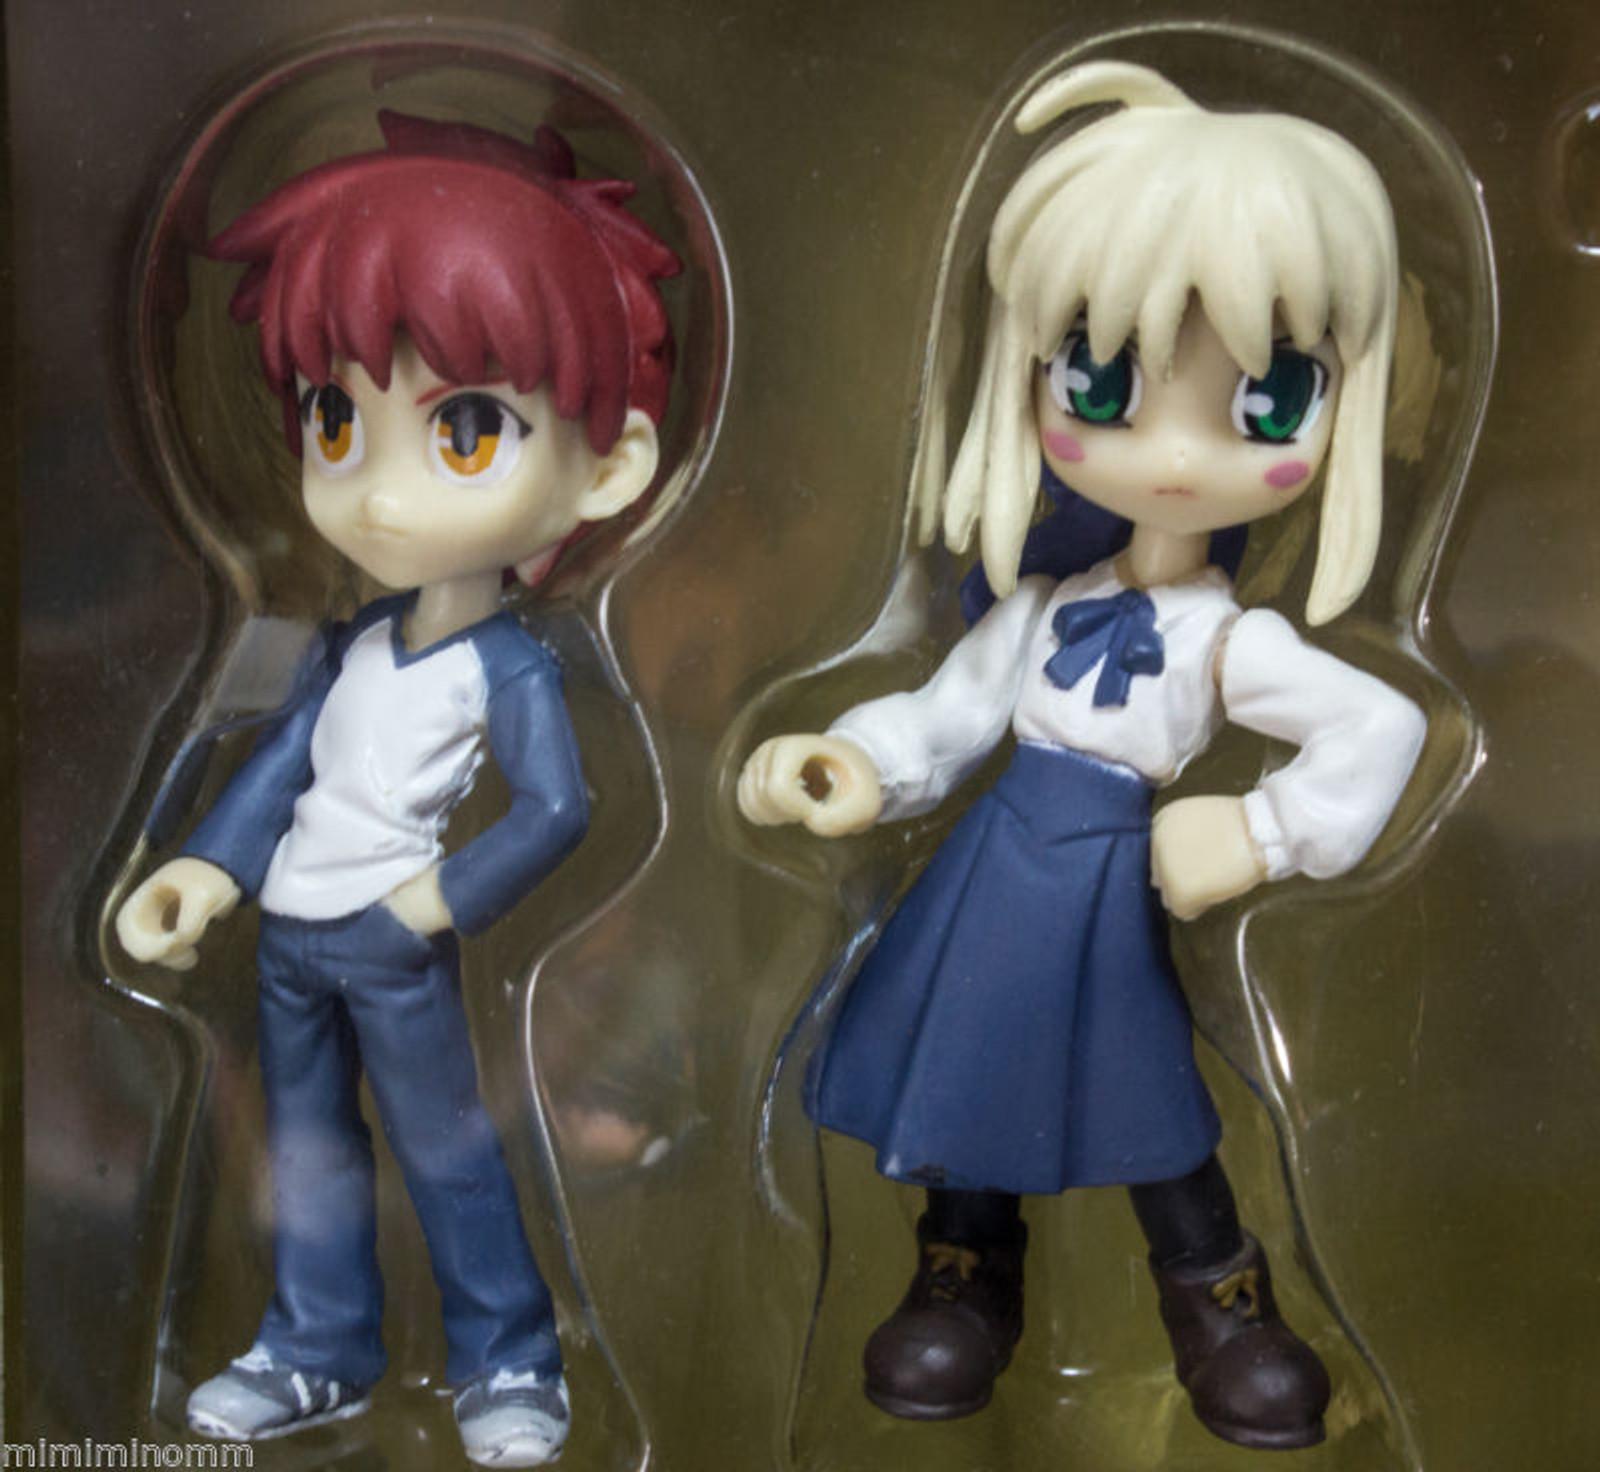 Fate/stay night Palm Scenery Saber & Siro Figure Weapon Set JAPAN ANIME